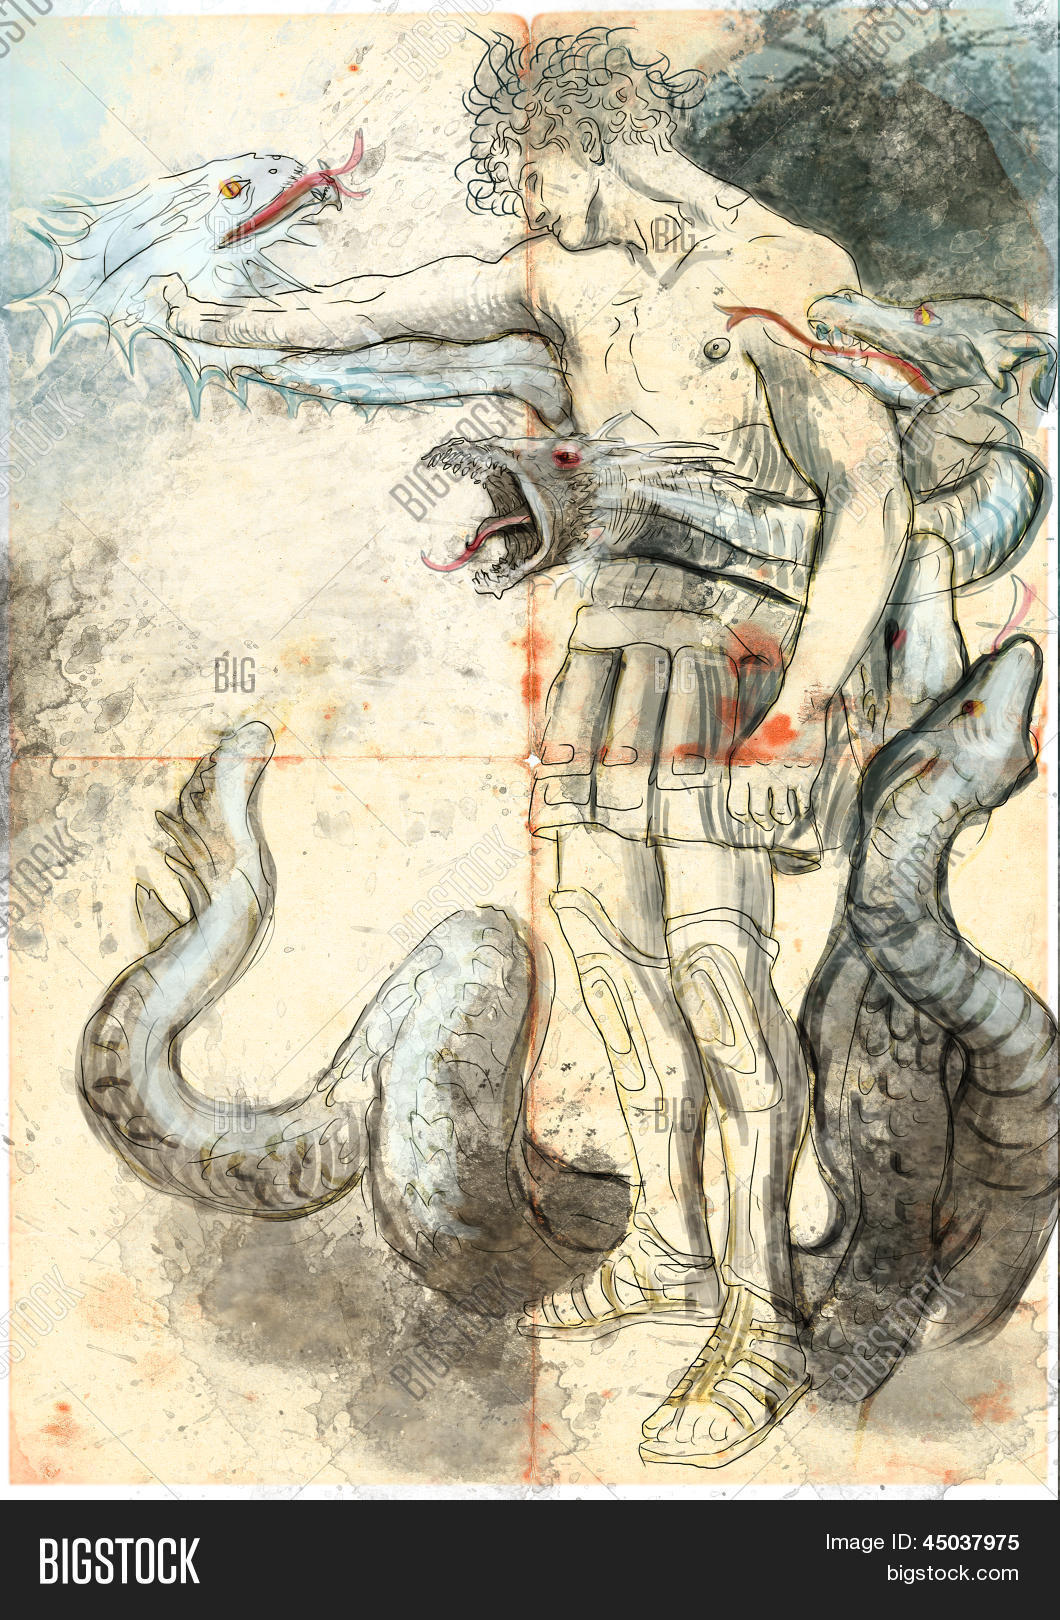 Hercules - Slay the nine-headed Lernaean Hydra. /// Full sized hand drawing.